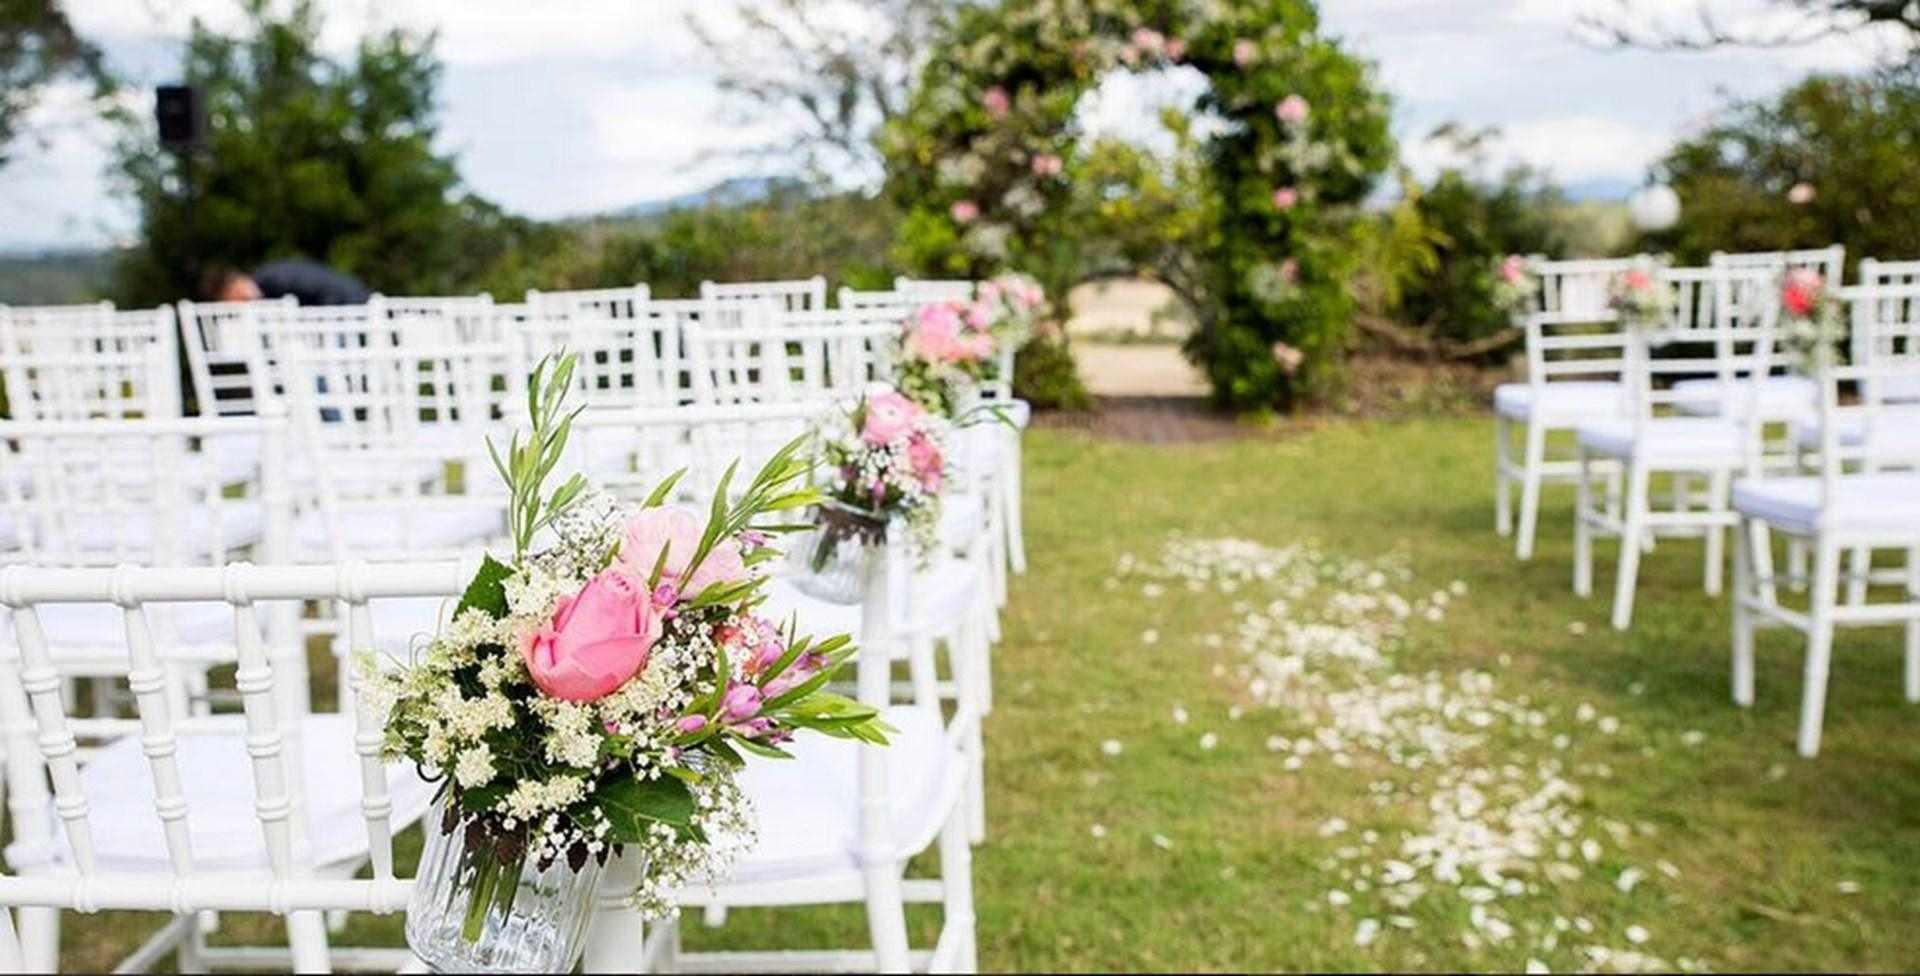 Wedding Venue - Spicers Hidden Vale 3 on Veilability